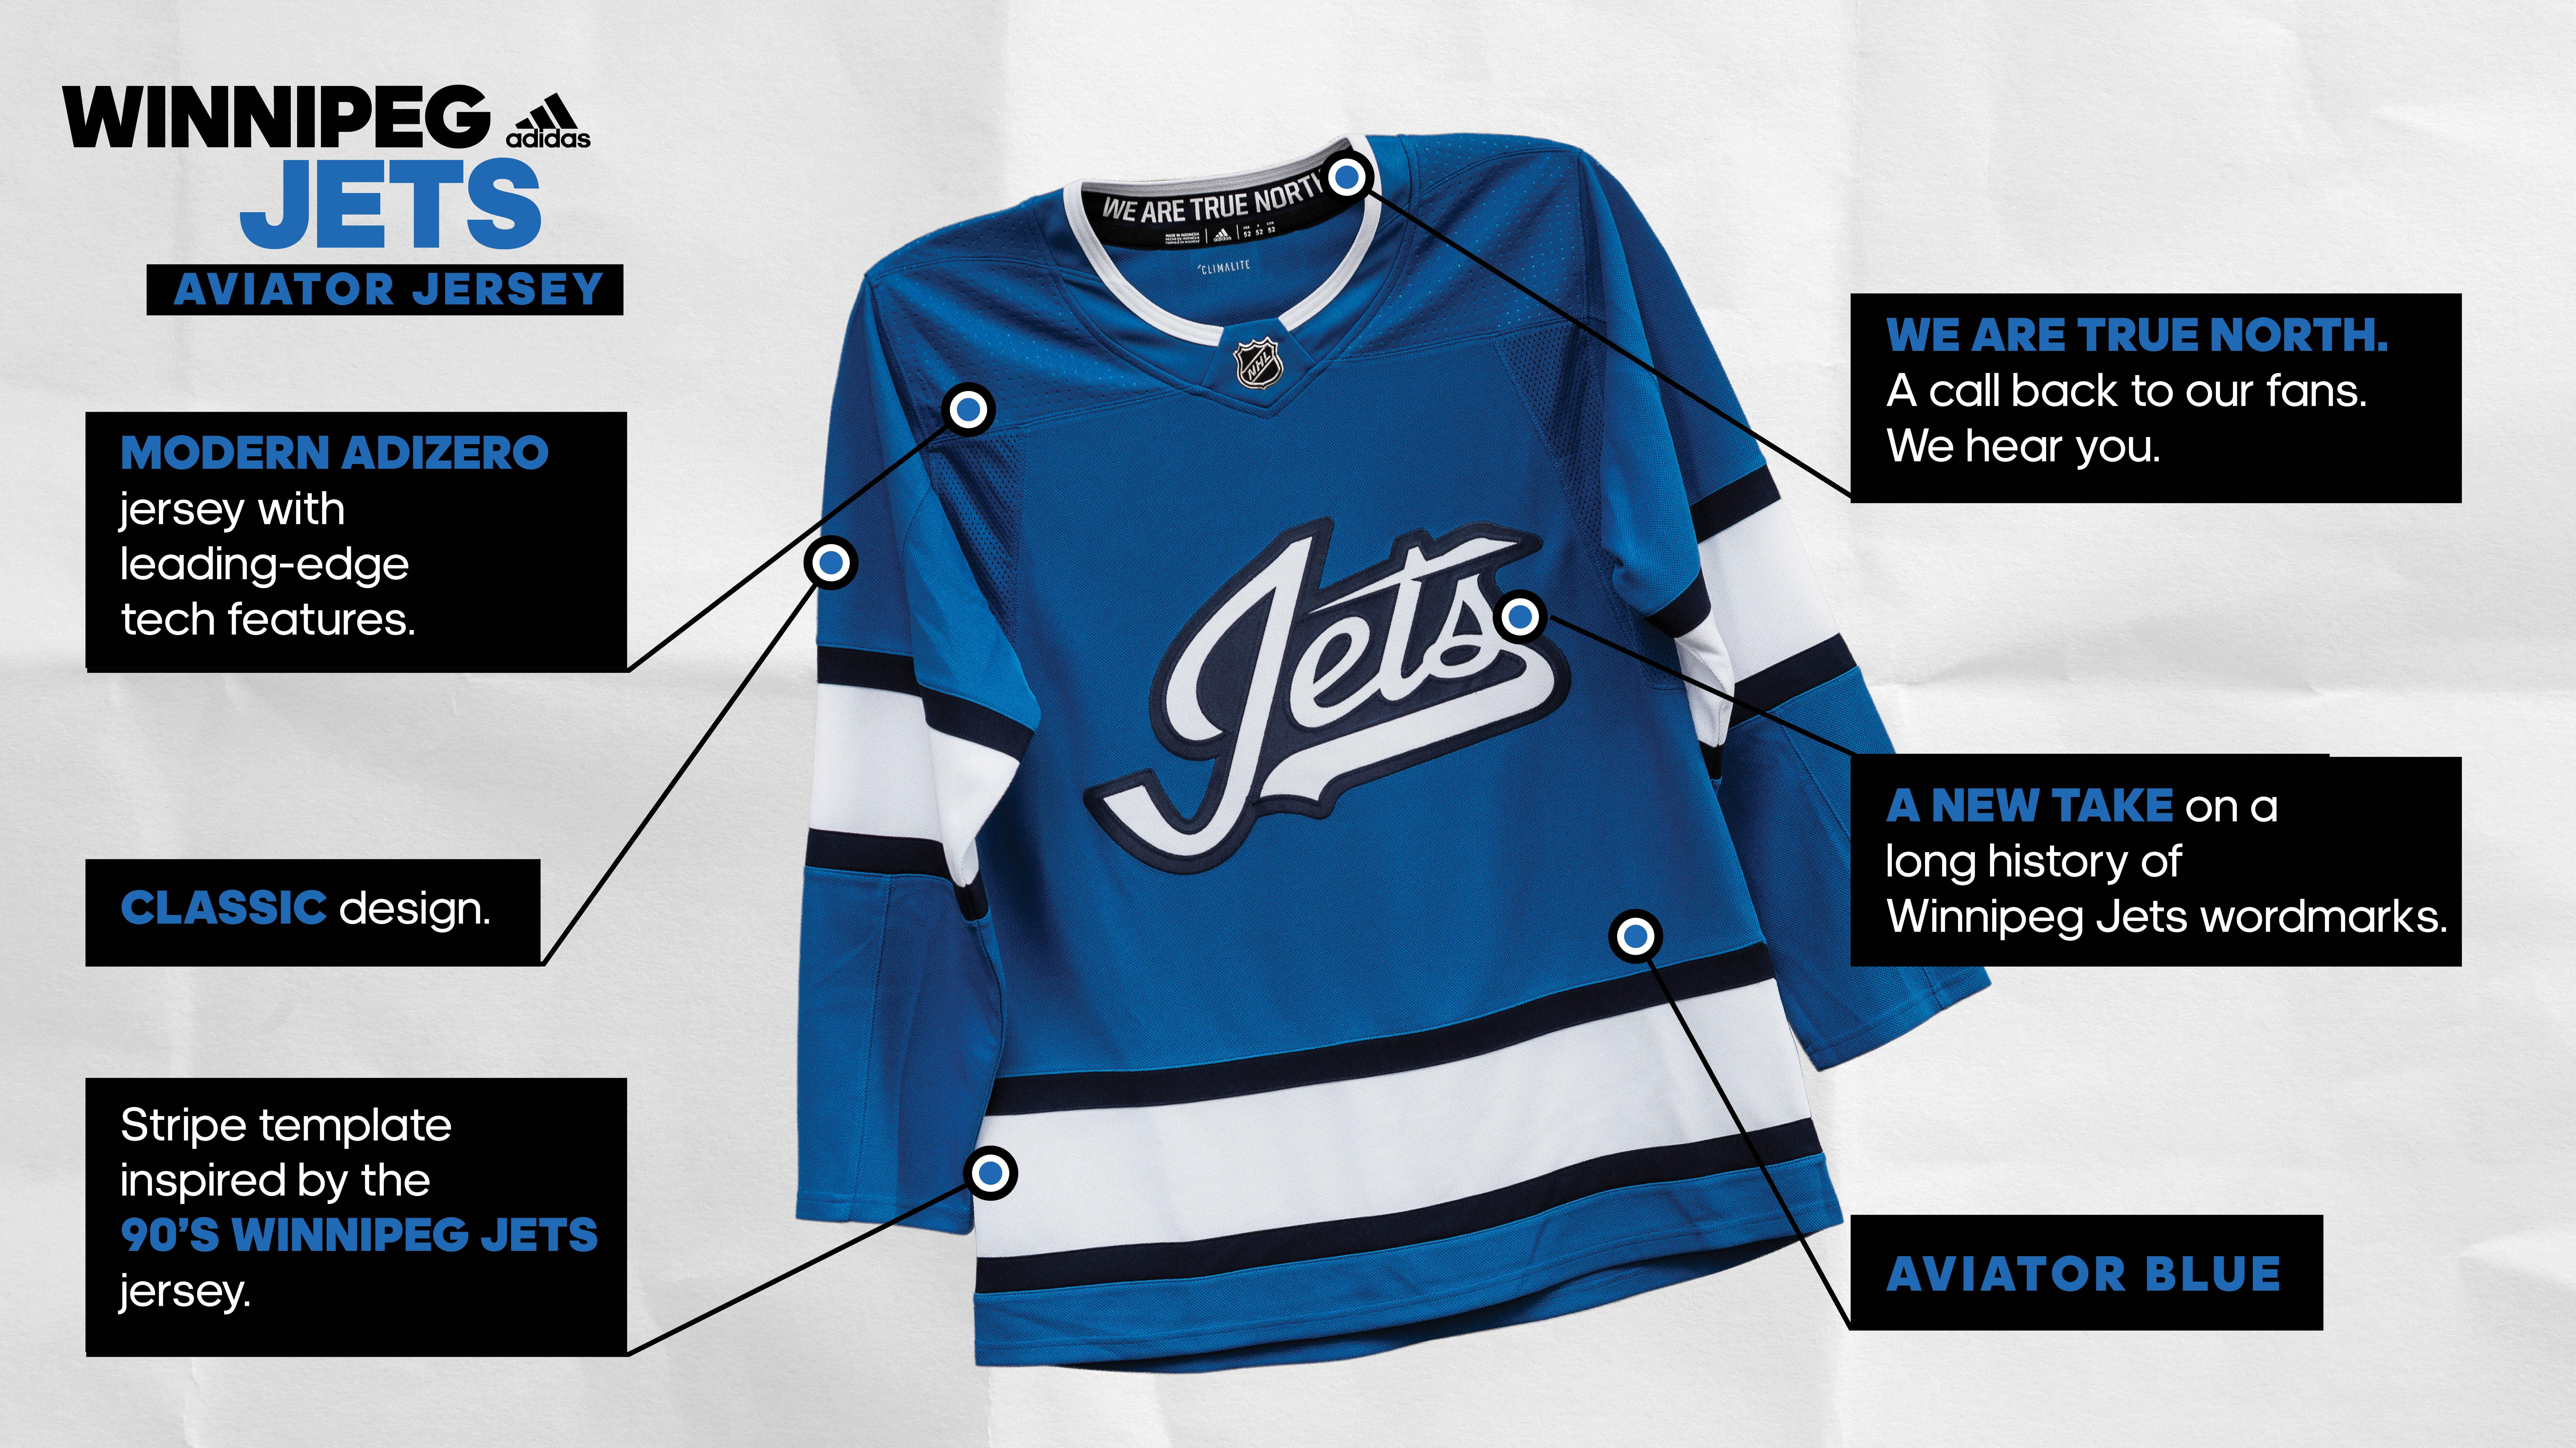 Winnipeg Jets Unveil Jersey In Aviator Blue With New Script Logo Cbc News